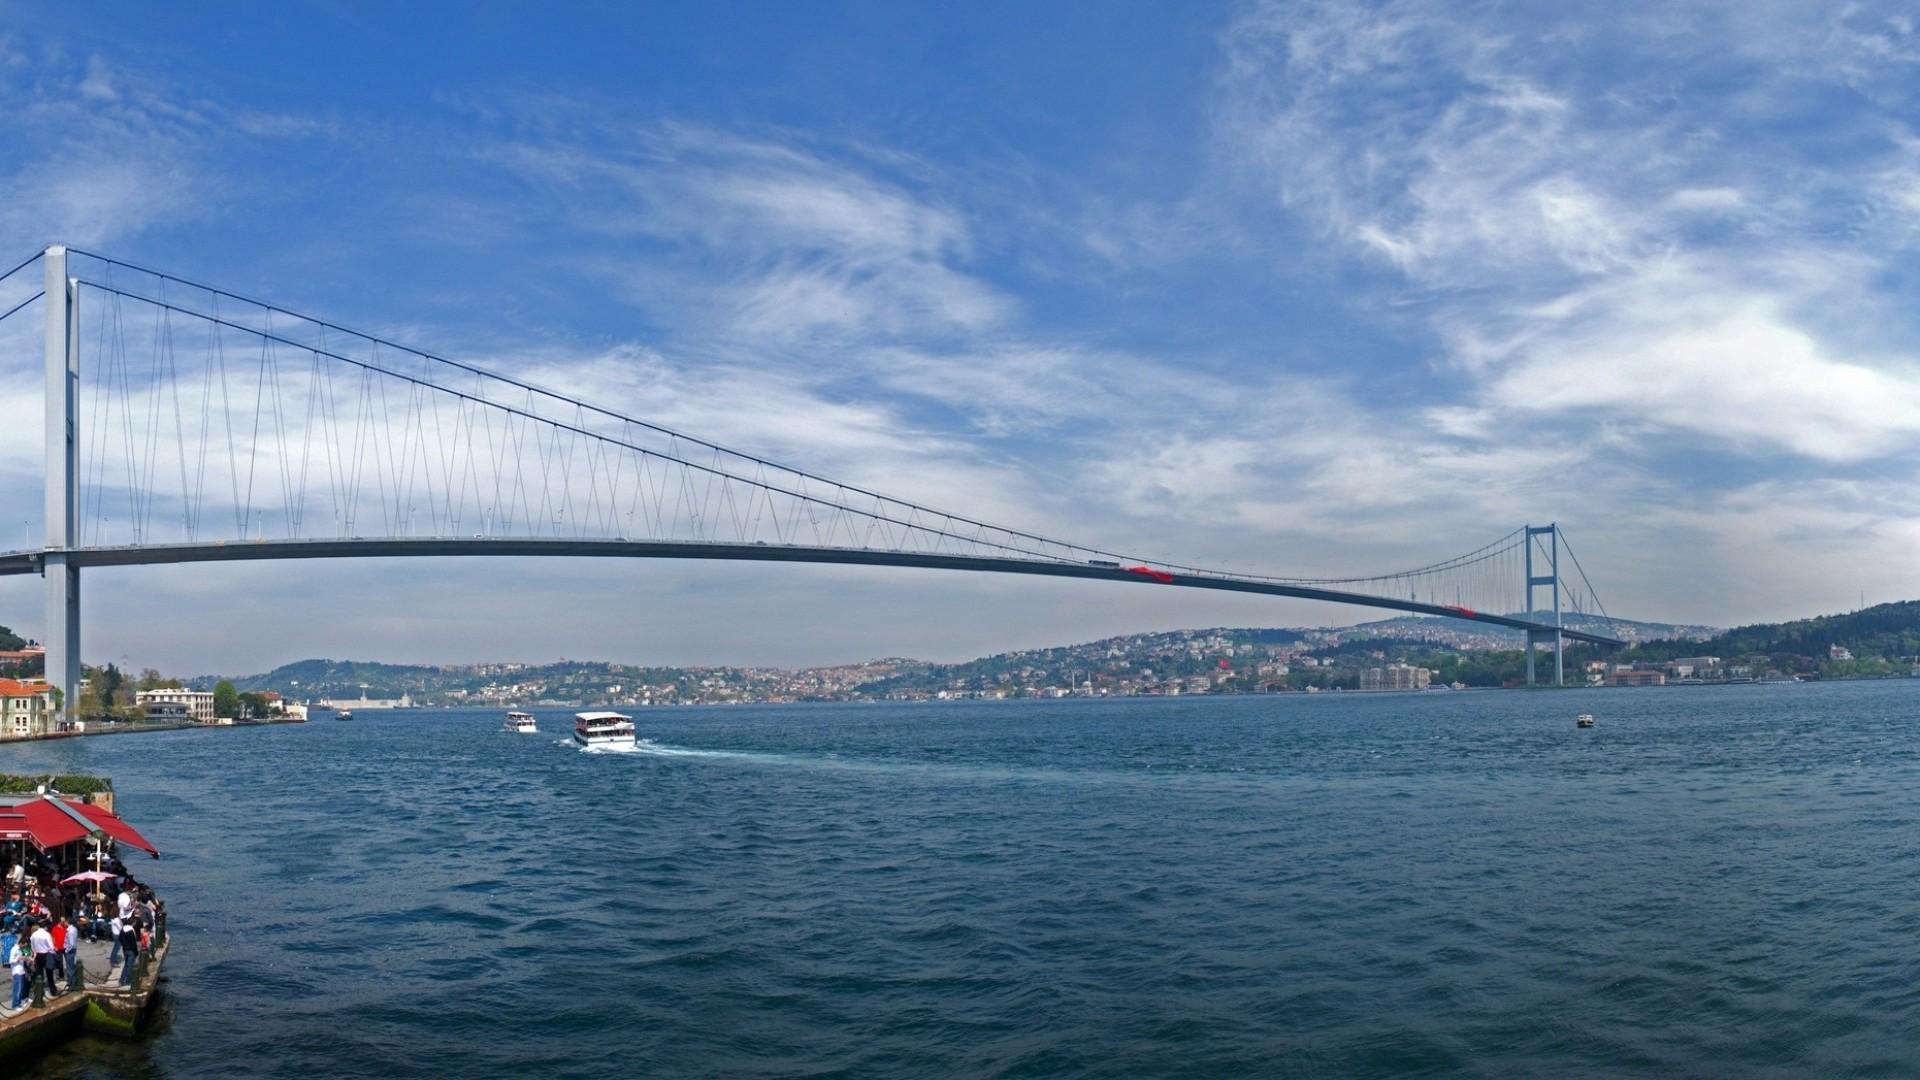 bosphorus_bridge_istanbul_turkey_cities_cityscapes_1920x1080_64854